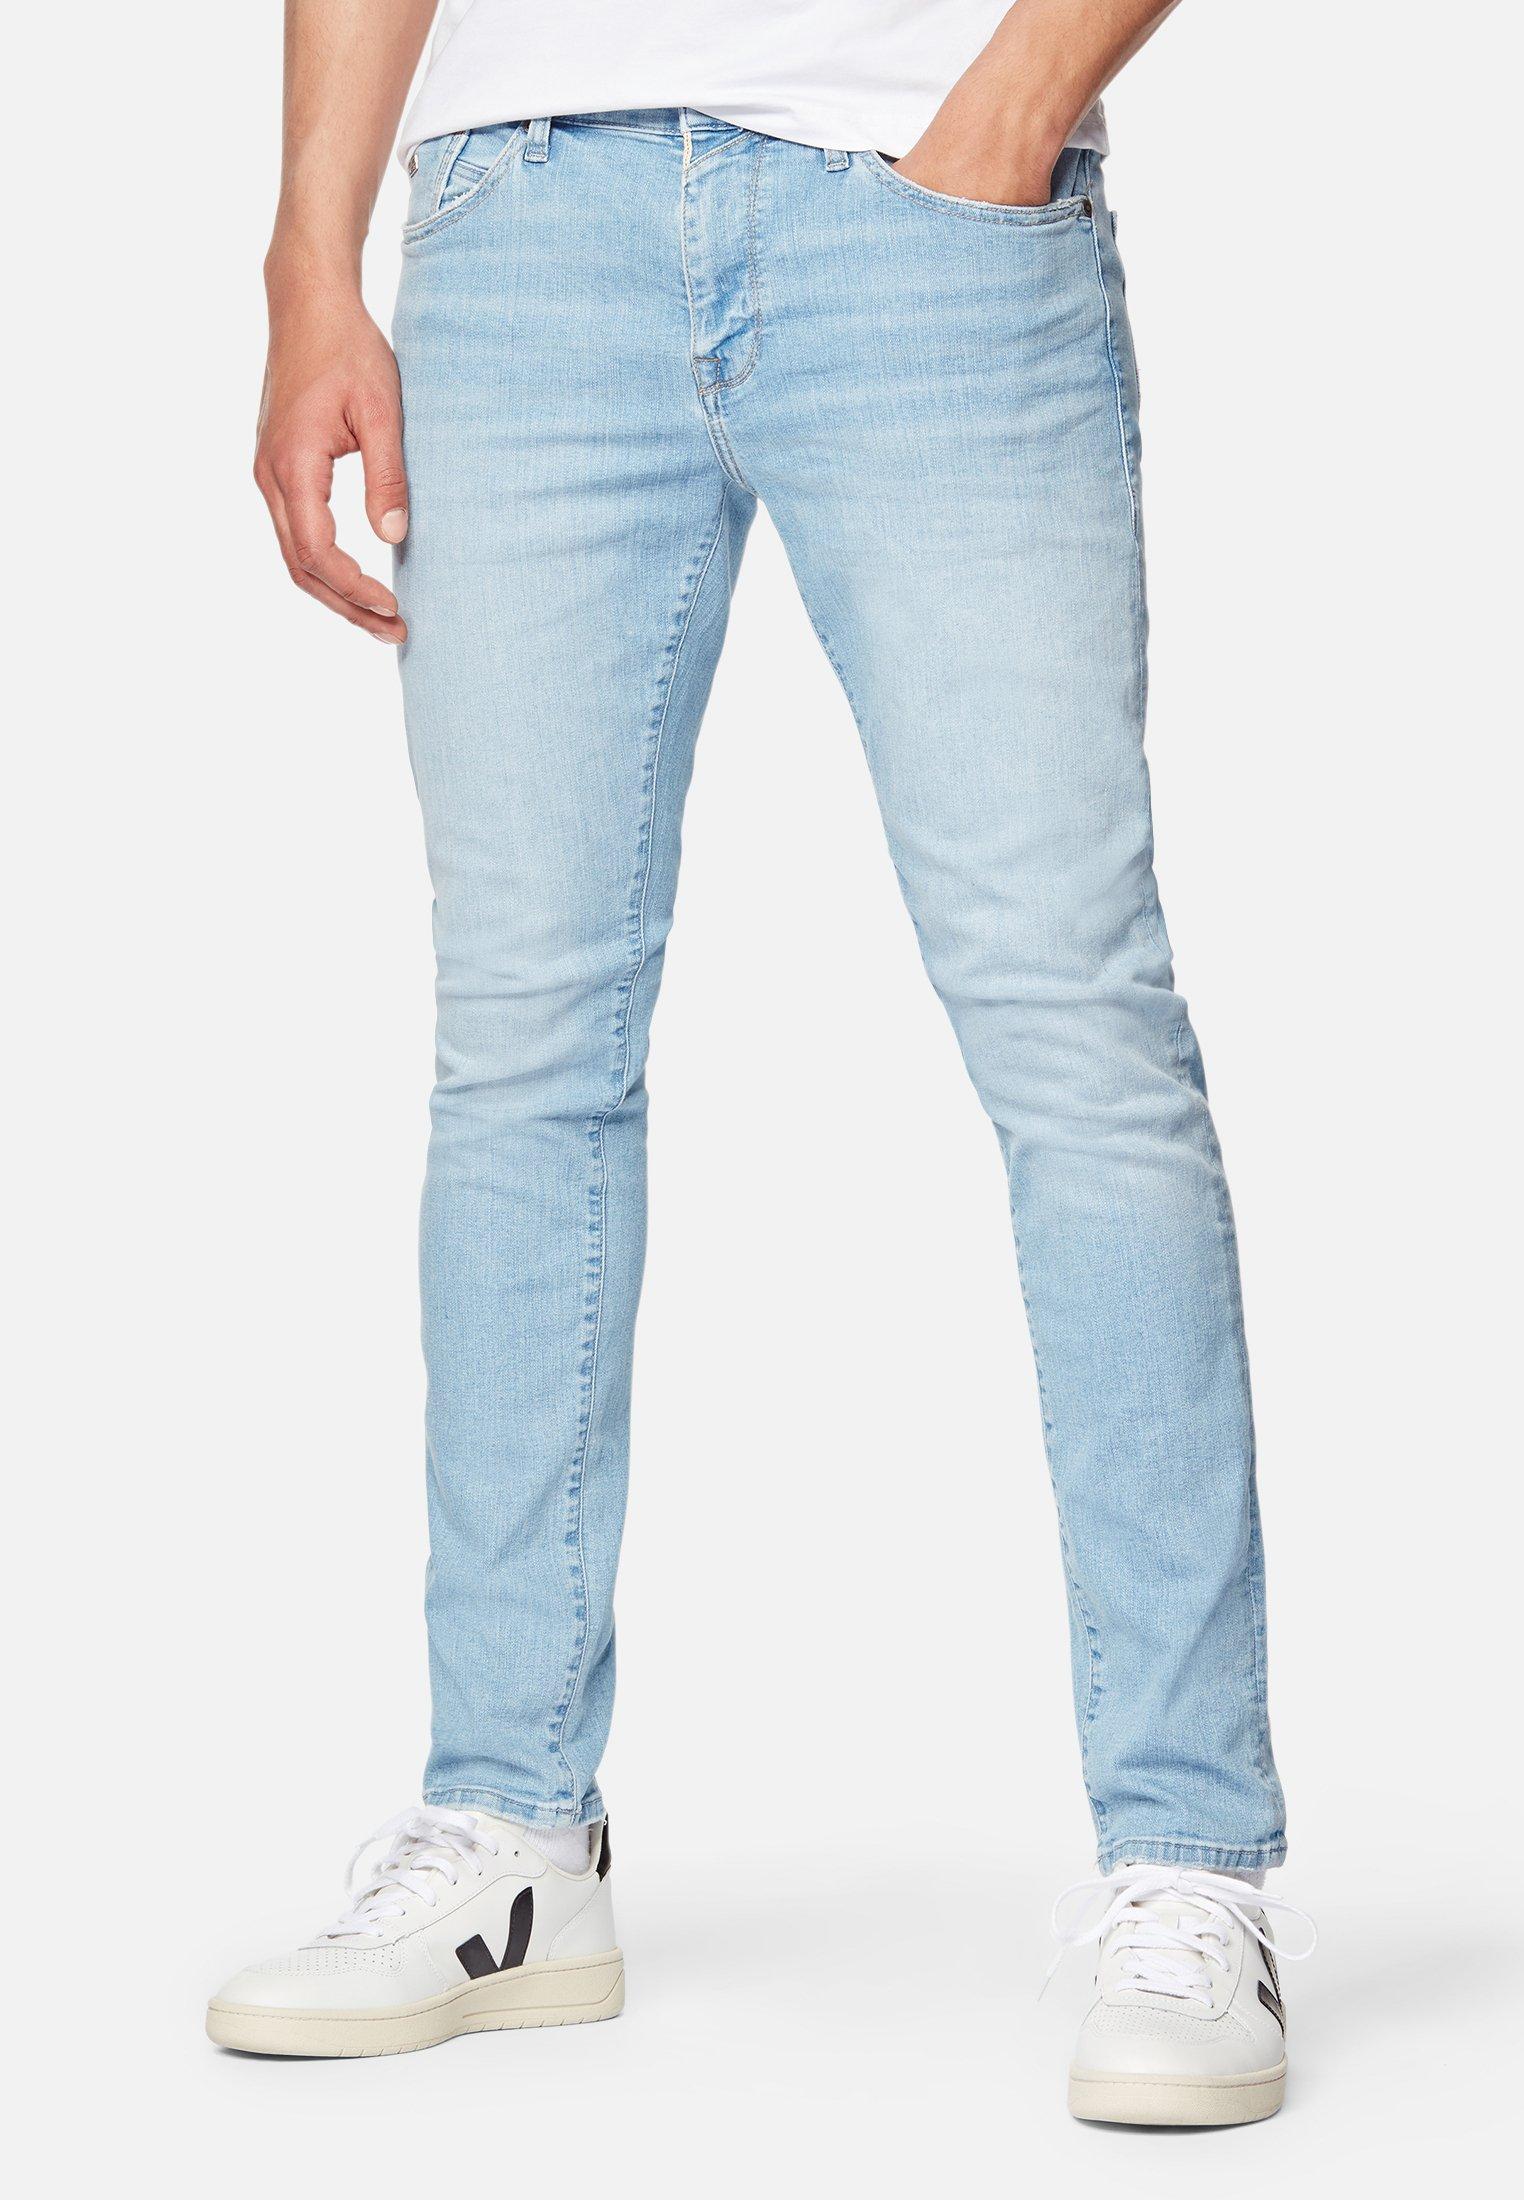 Herren Jeans Skinny Fit - blue